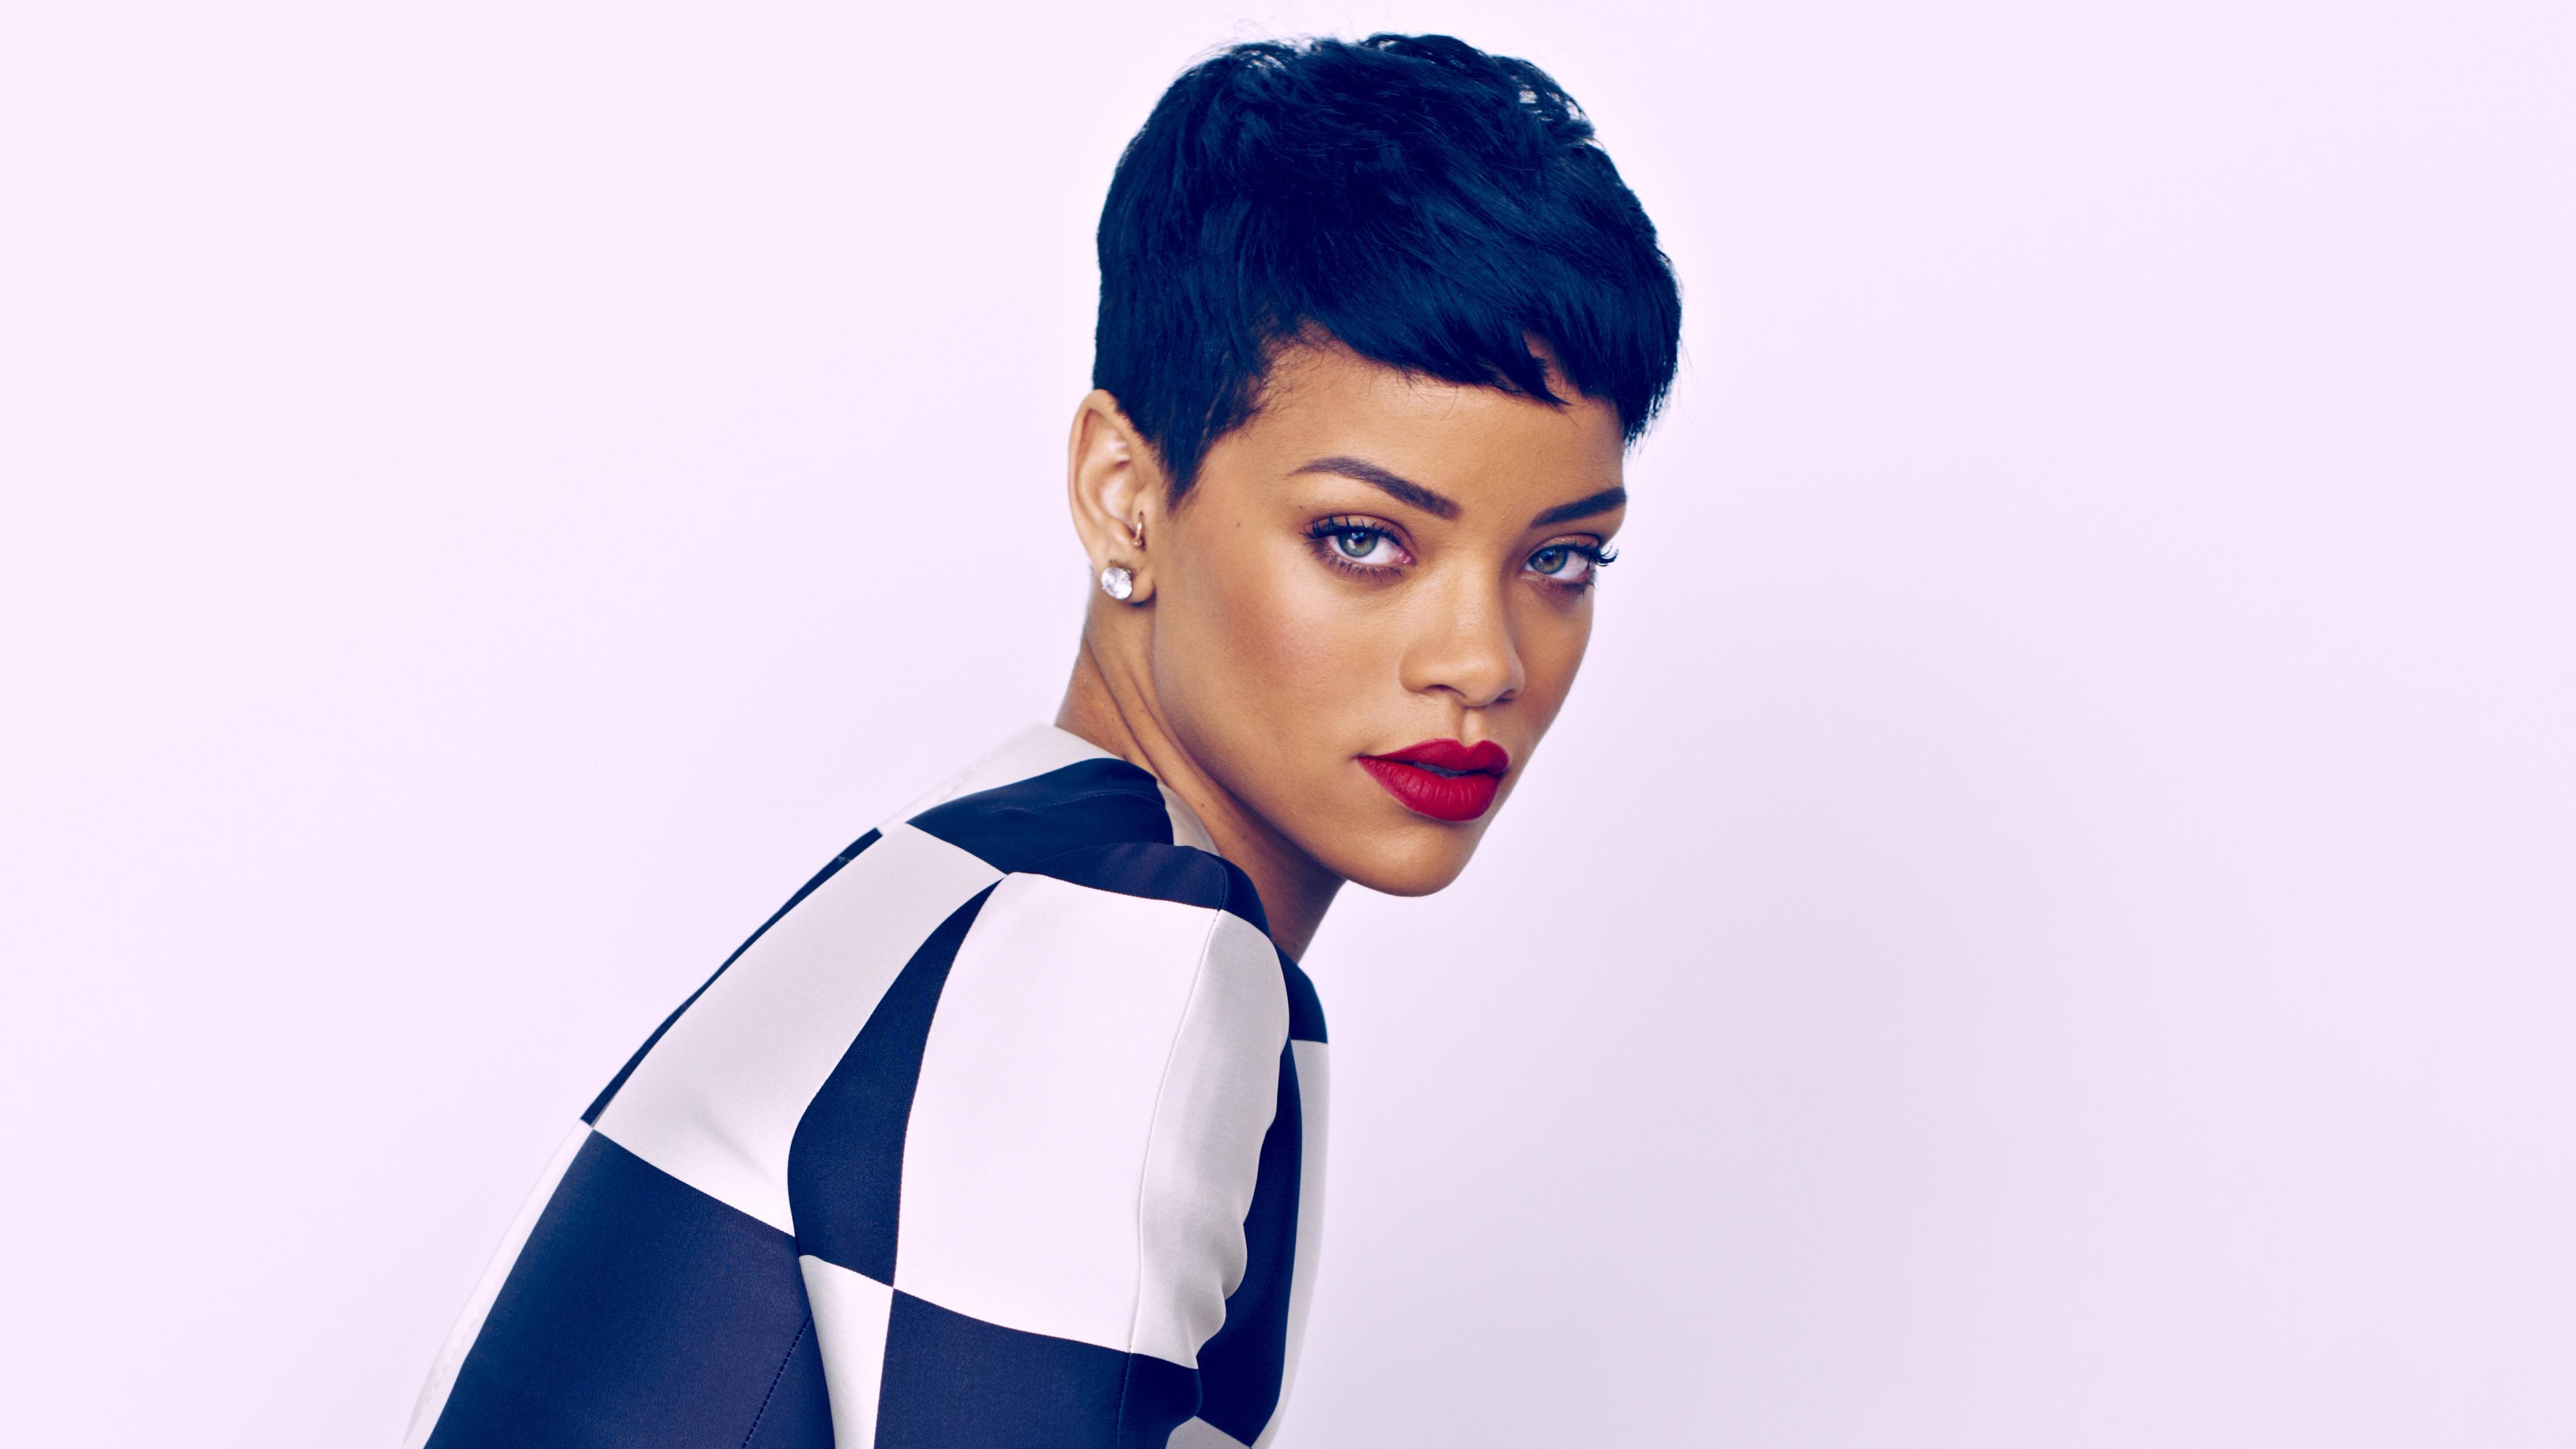 rihanna elle uk 4k 1542236259 - Rihanna Elle Uk 4k - rihanna wallpapers, music wallpapers, hd-wallpapers, girls wallpapers, celebrities wallpapers, 4k-wallpapers